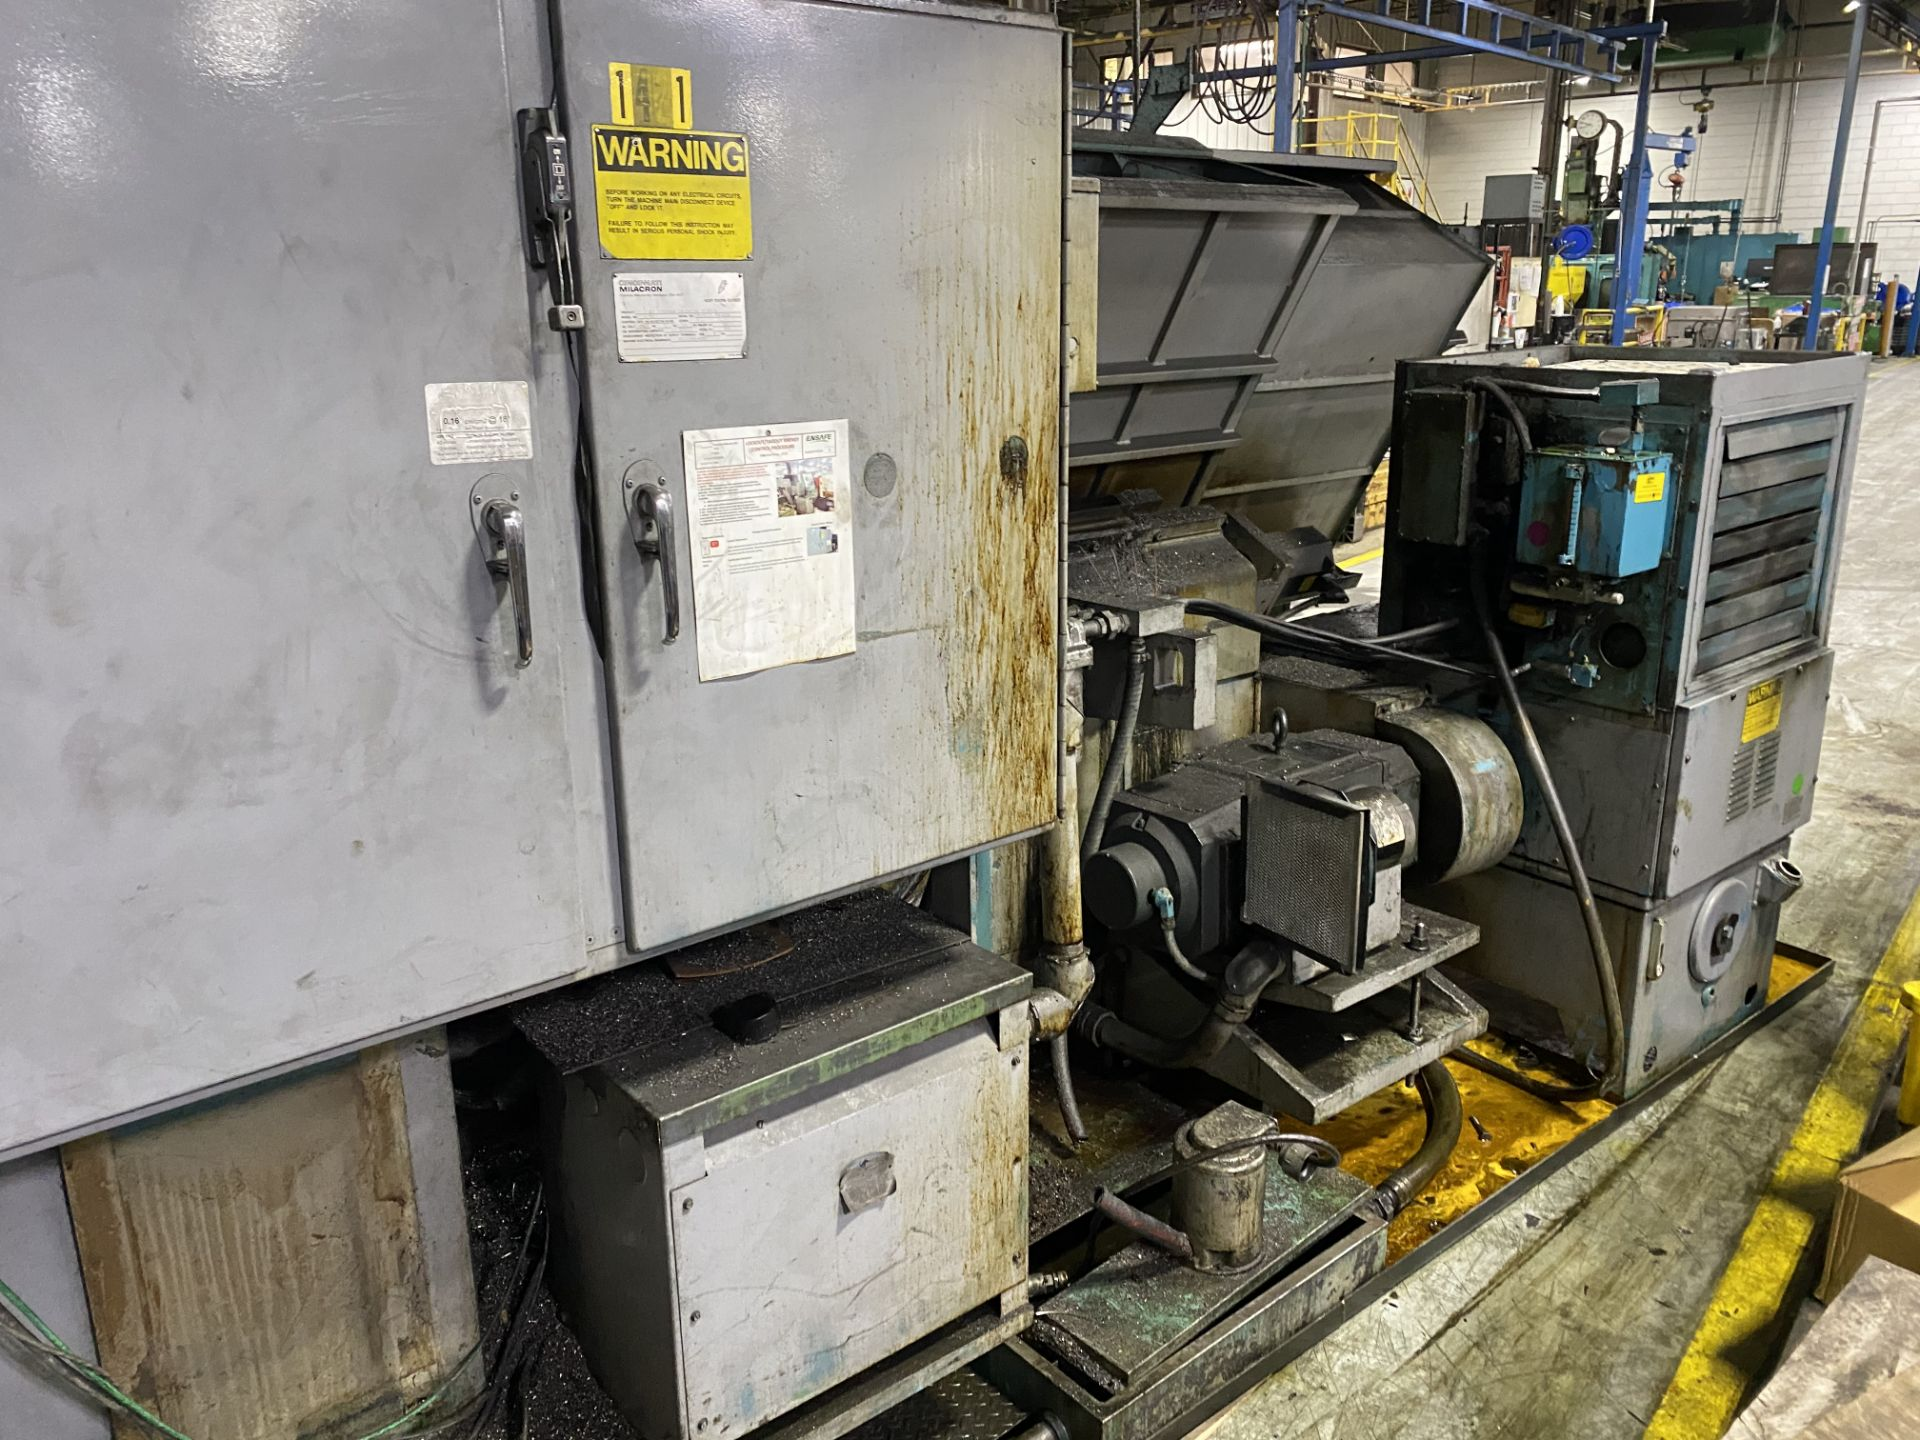 Cincinnati Cinturn 12 CNC Lathe w/ Fanuc Control RETROFIT ***PARTS MACHINE, NO CONTROLLER** - Image 4 of 8